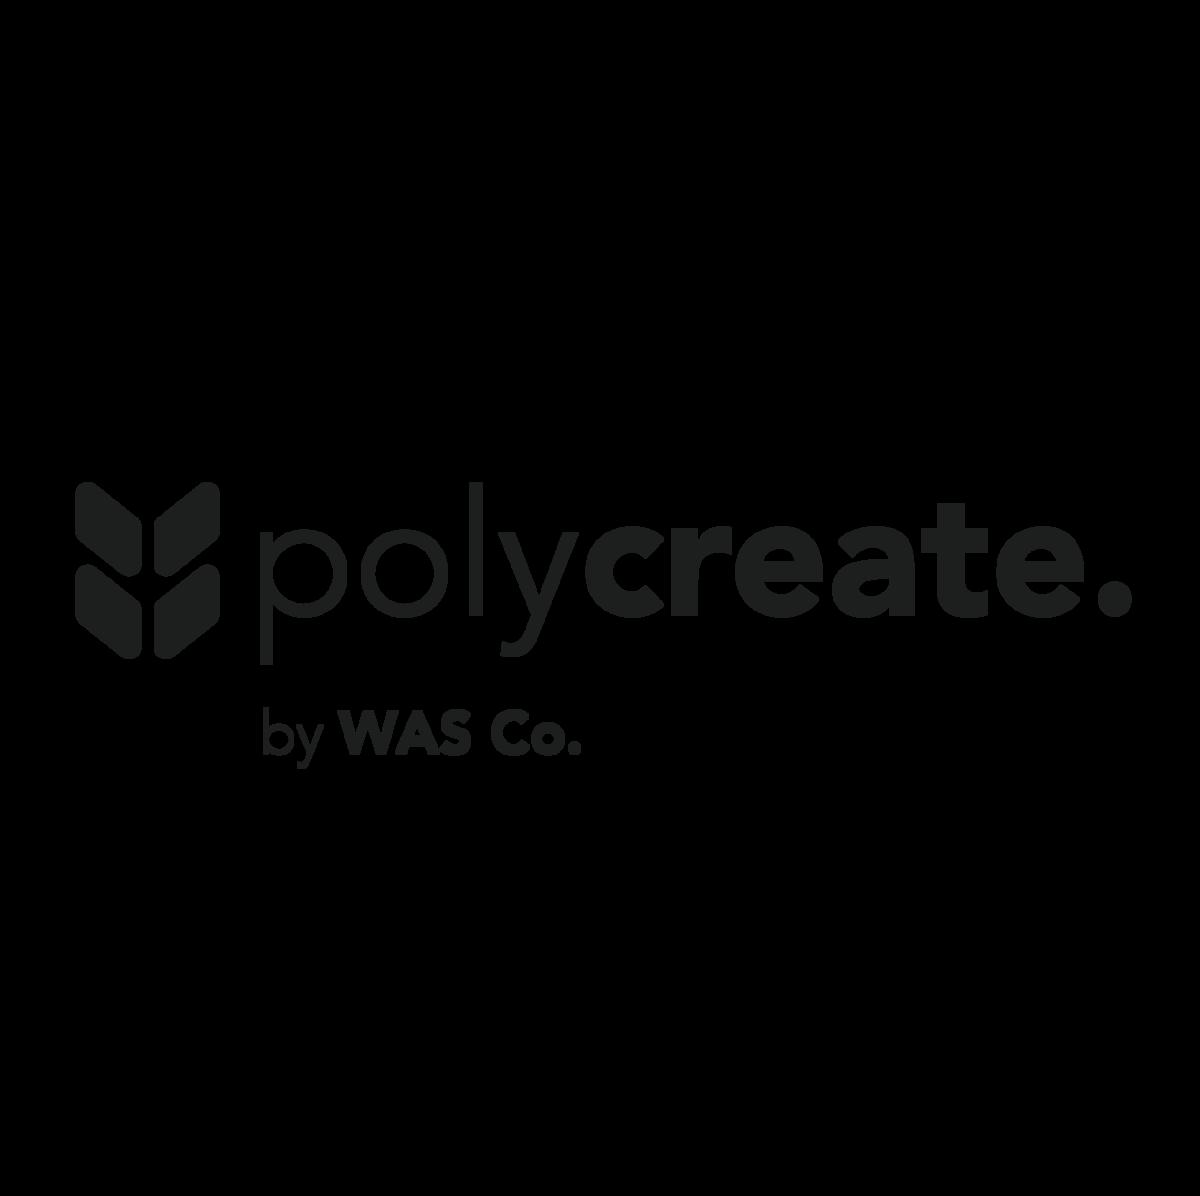 Polycreate